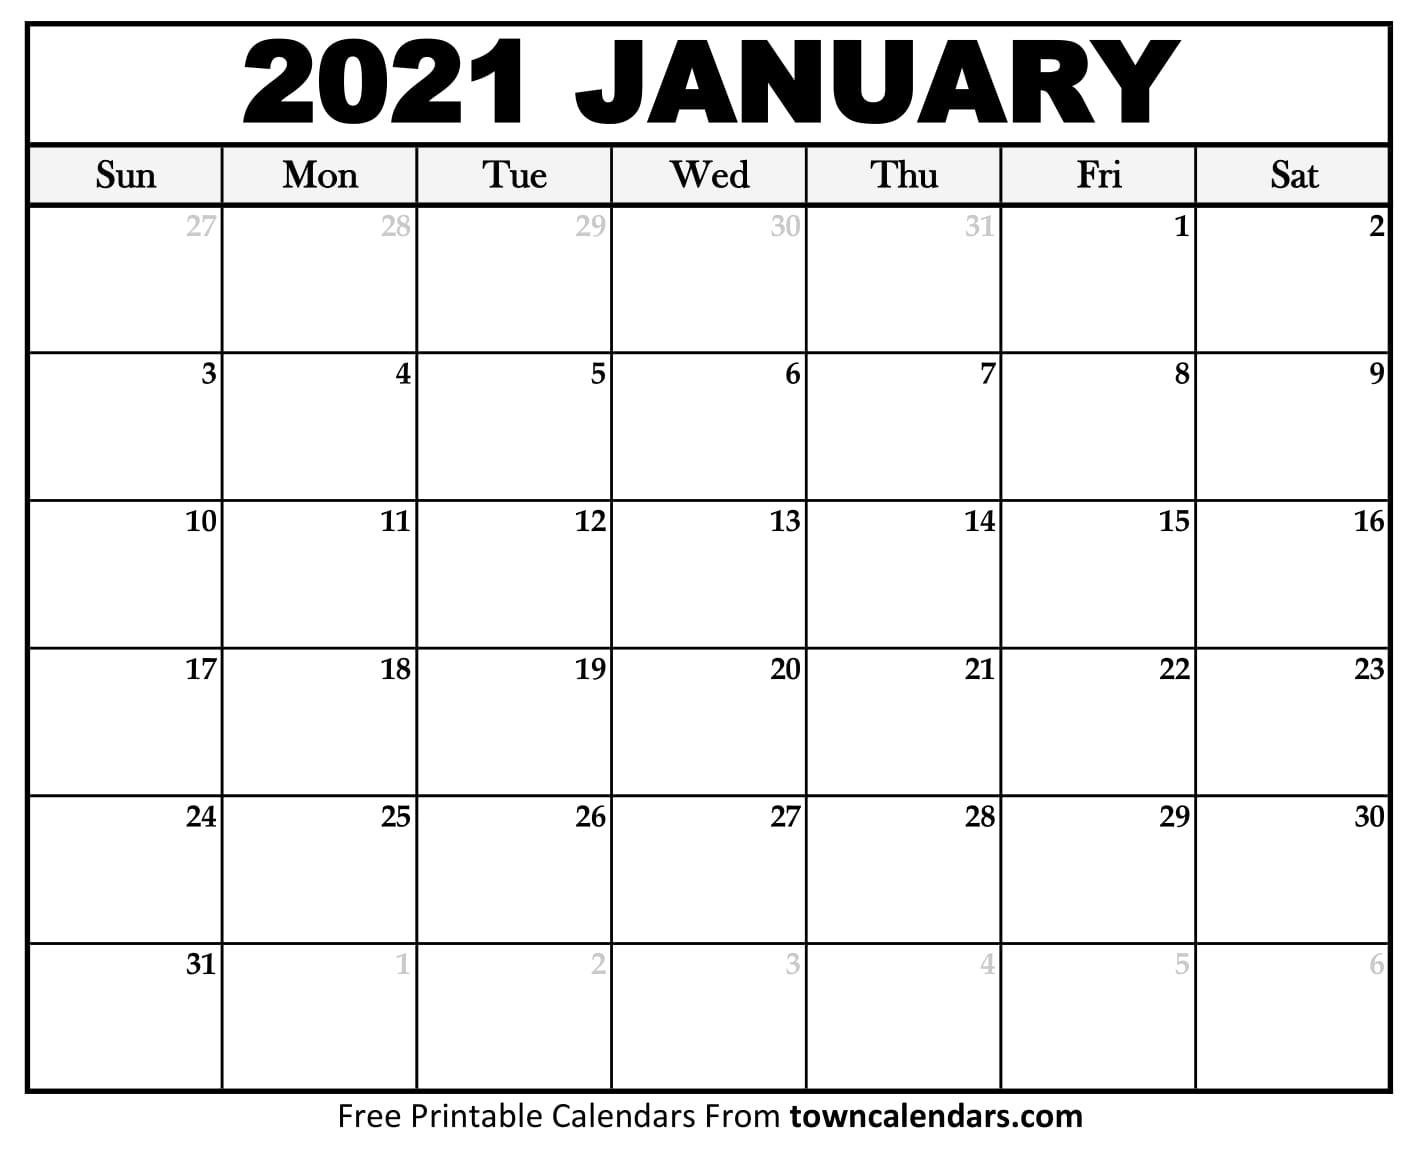 Printable January 2021 Calendar - Towncalendars